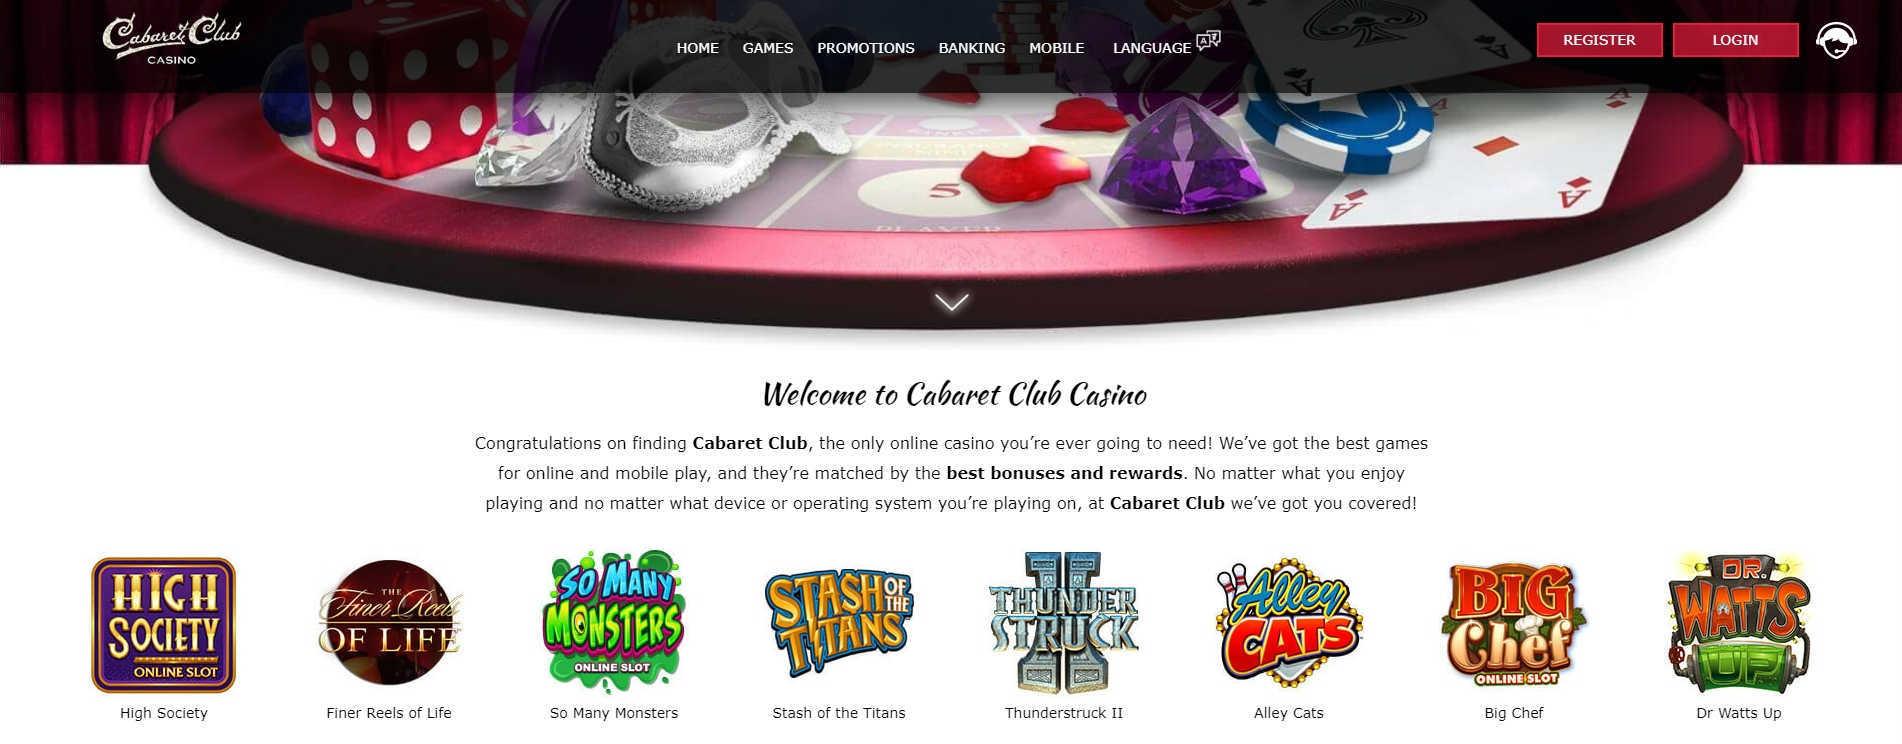 Cabaret Club Casino Online Casino Online Games